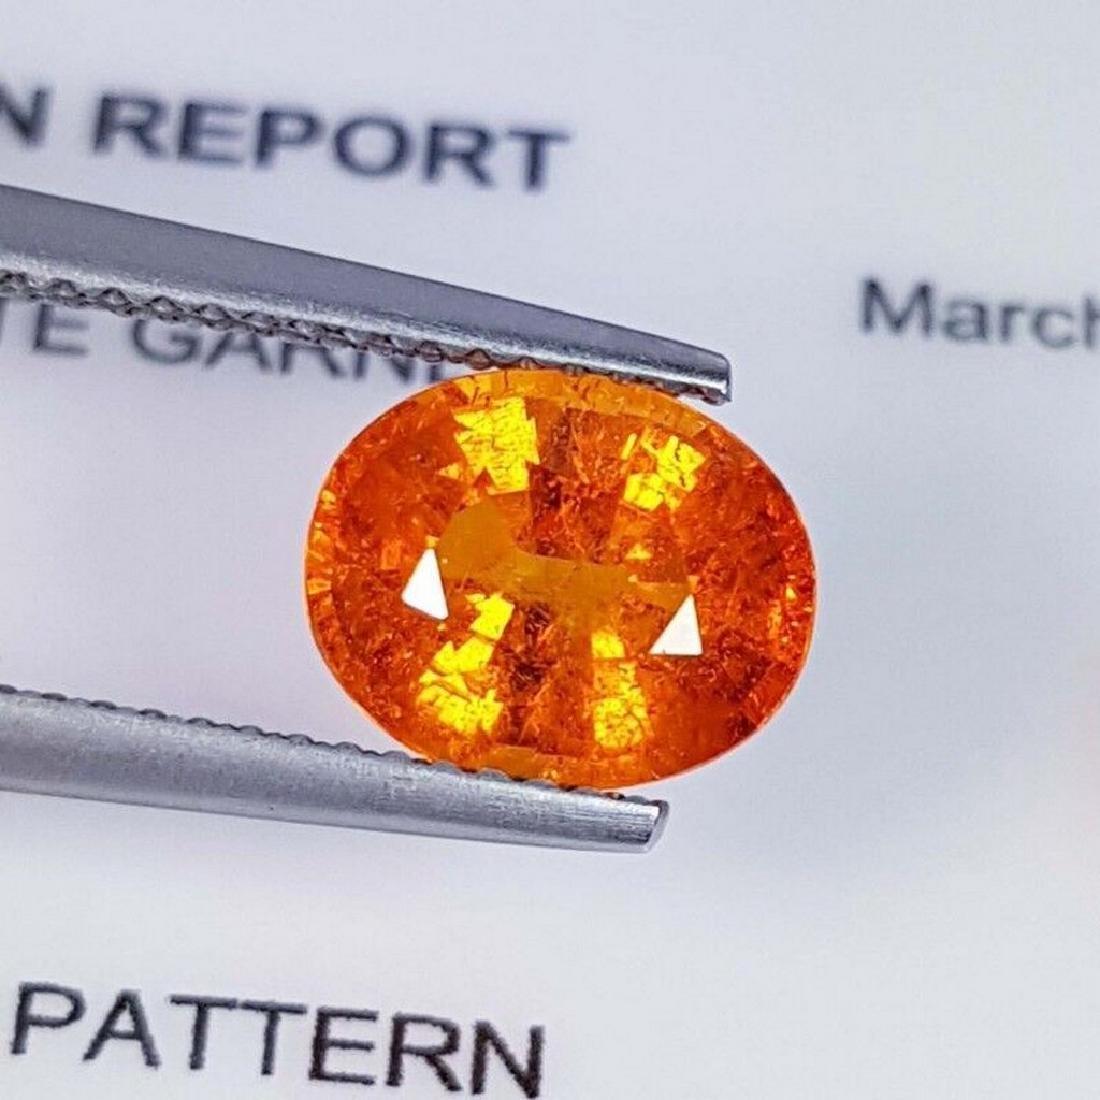 IGI CERTIFIED Spessartite Granet - 2.84 ct - 4